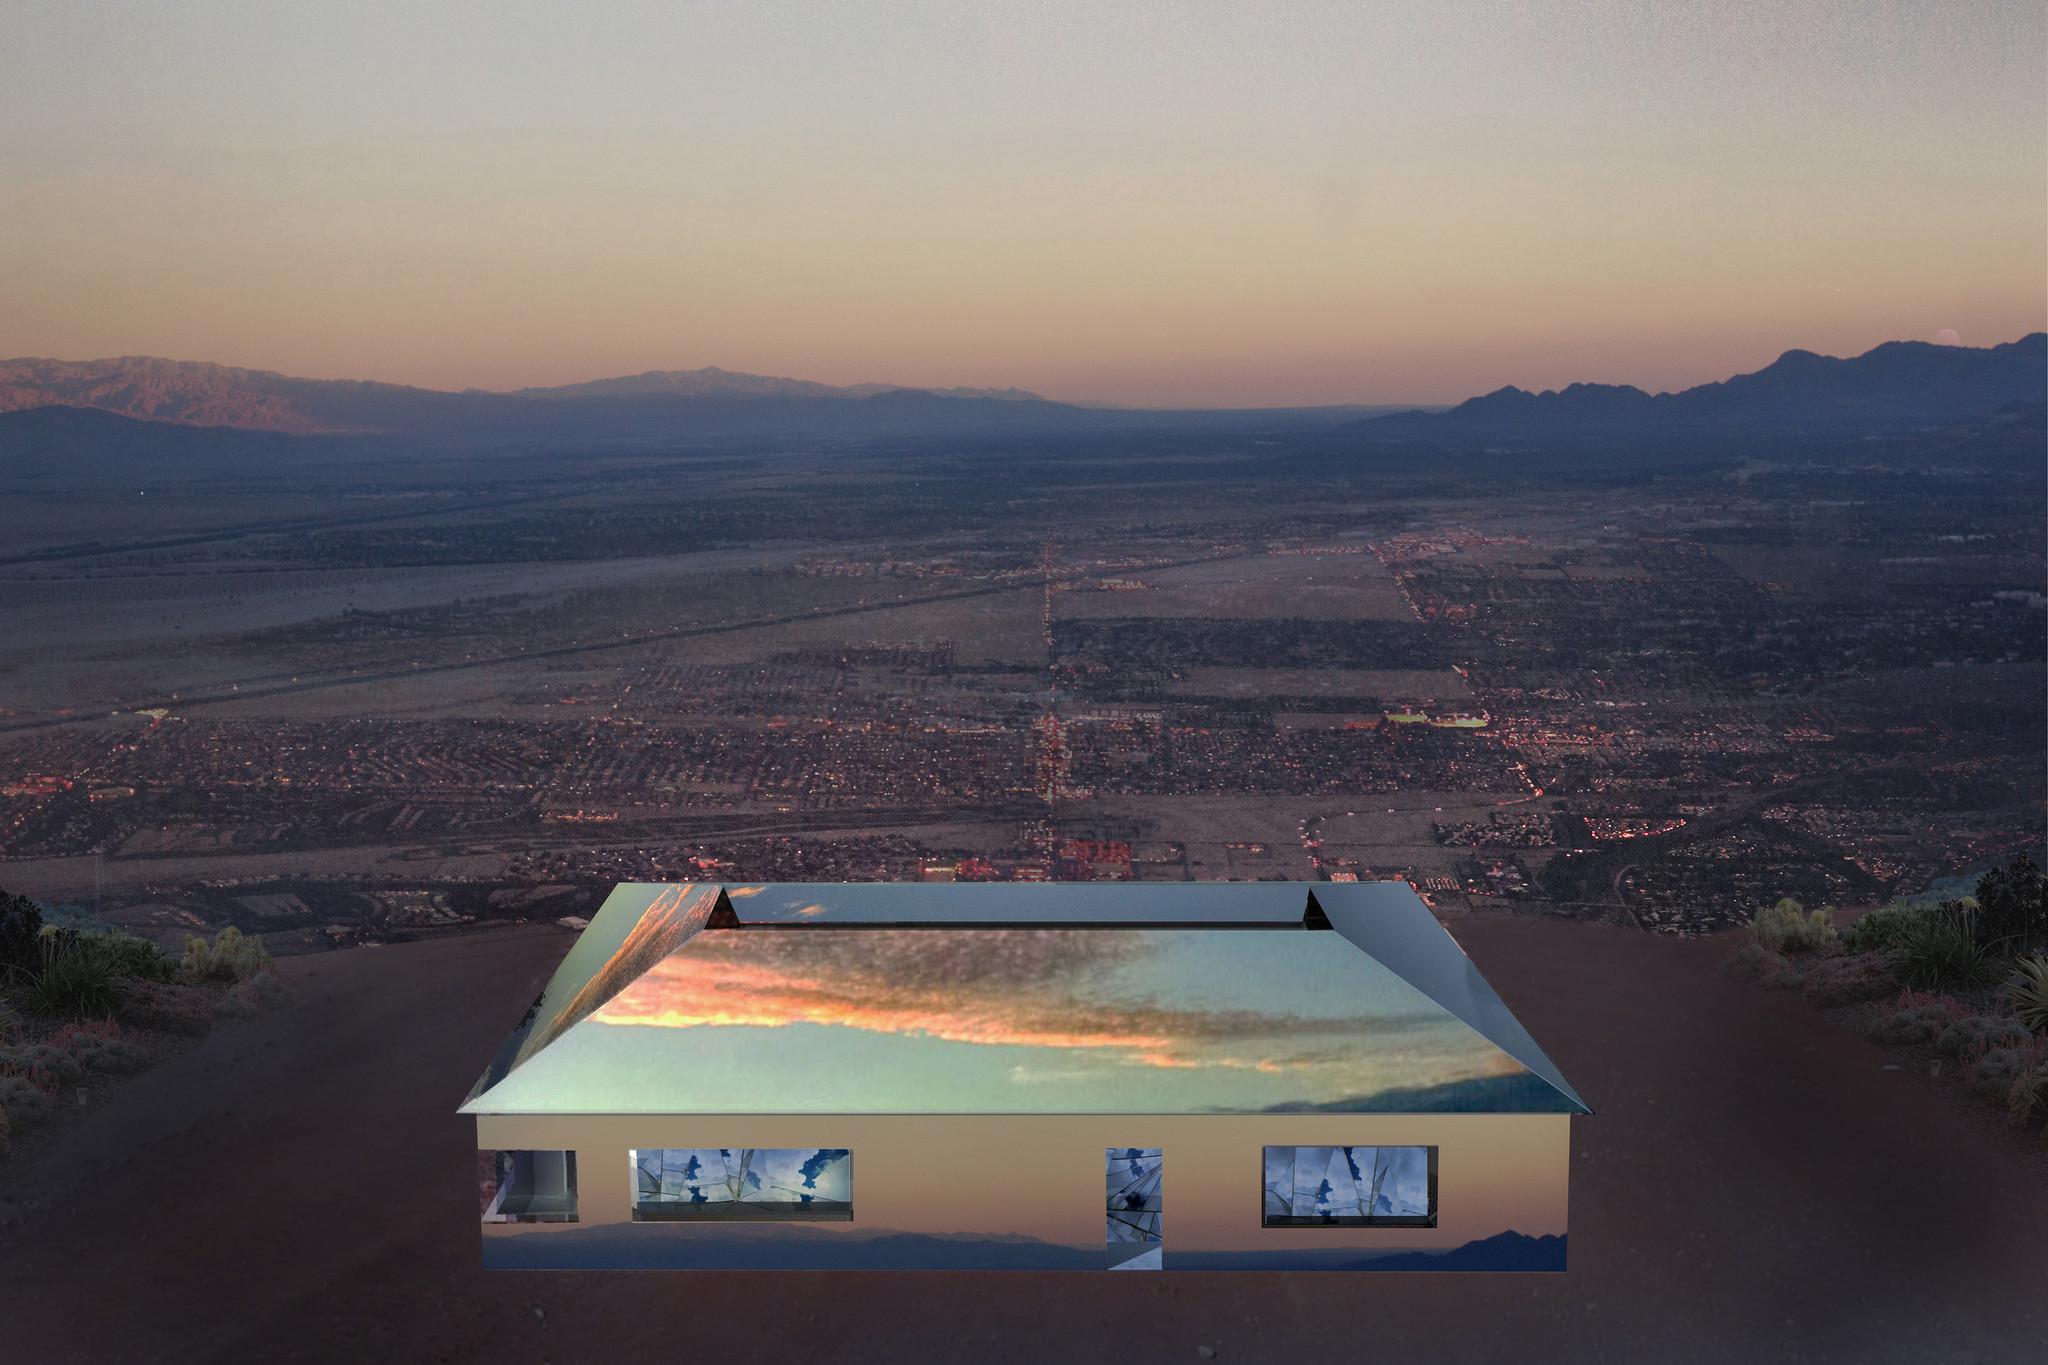 Desert X aims to be the Coachella of the art world. Here's a sneak peek